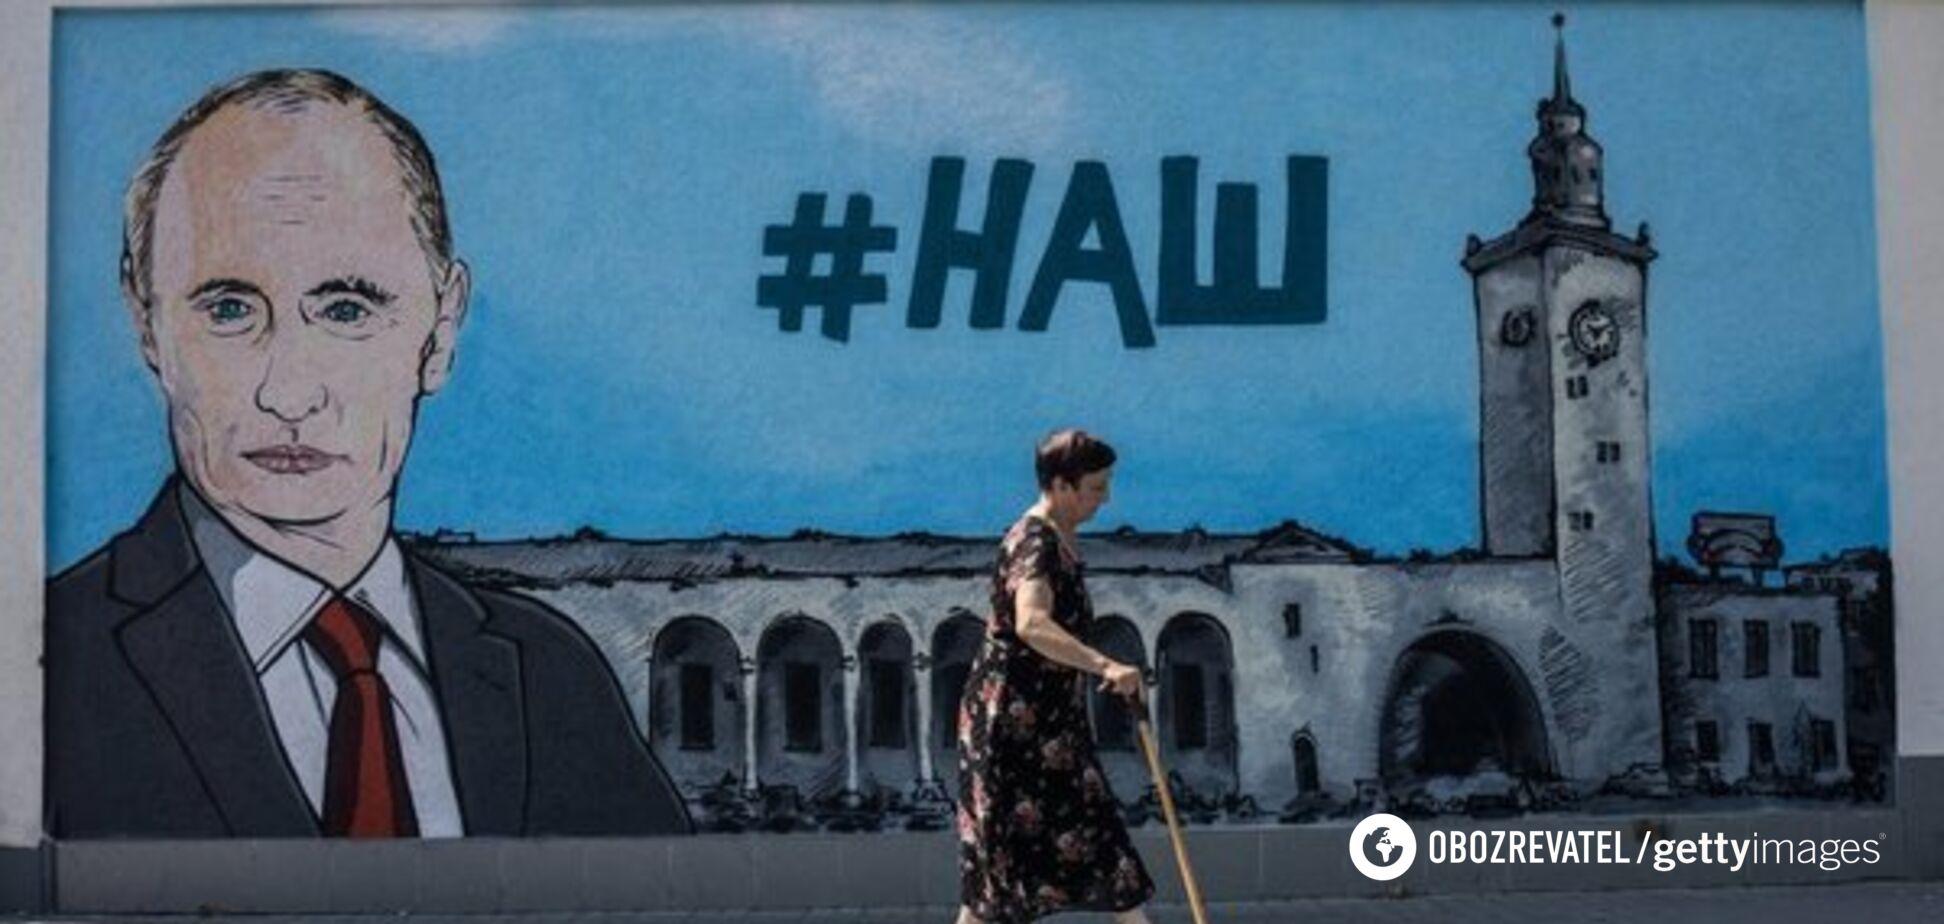 'Недоливають': у Криму поскаржилися на проблеми з їжею